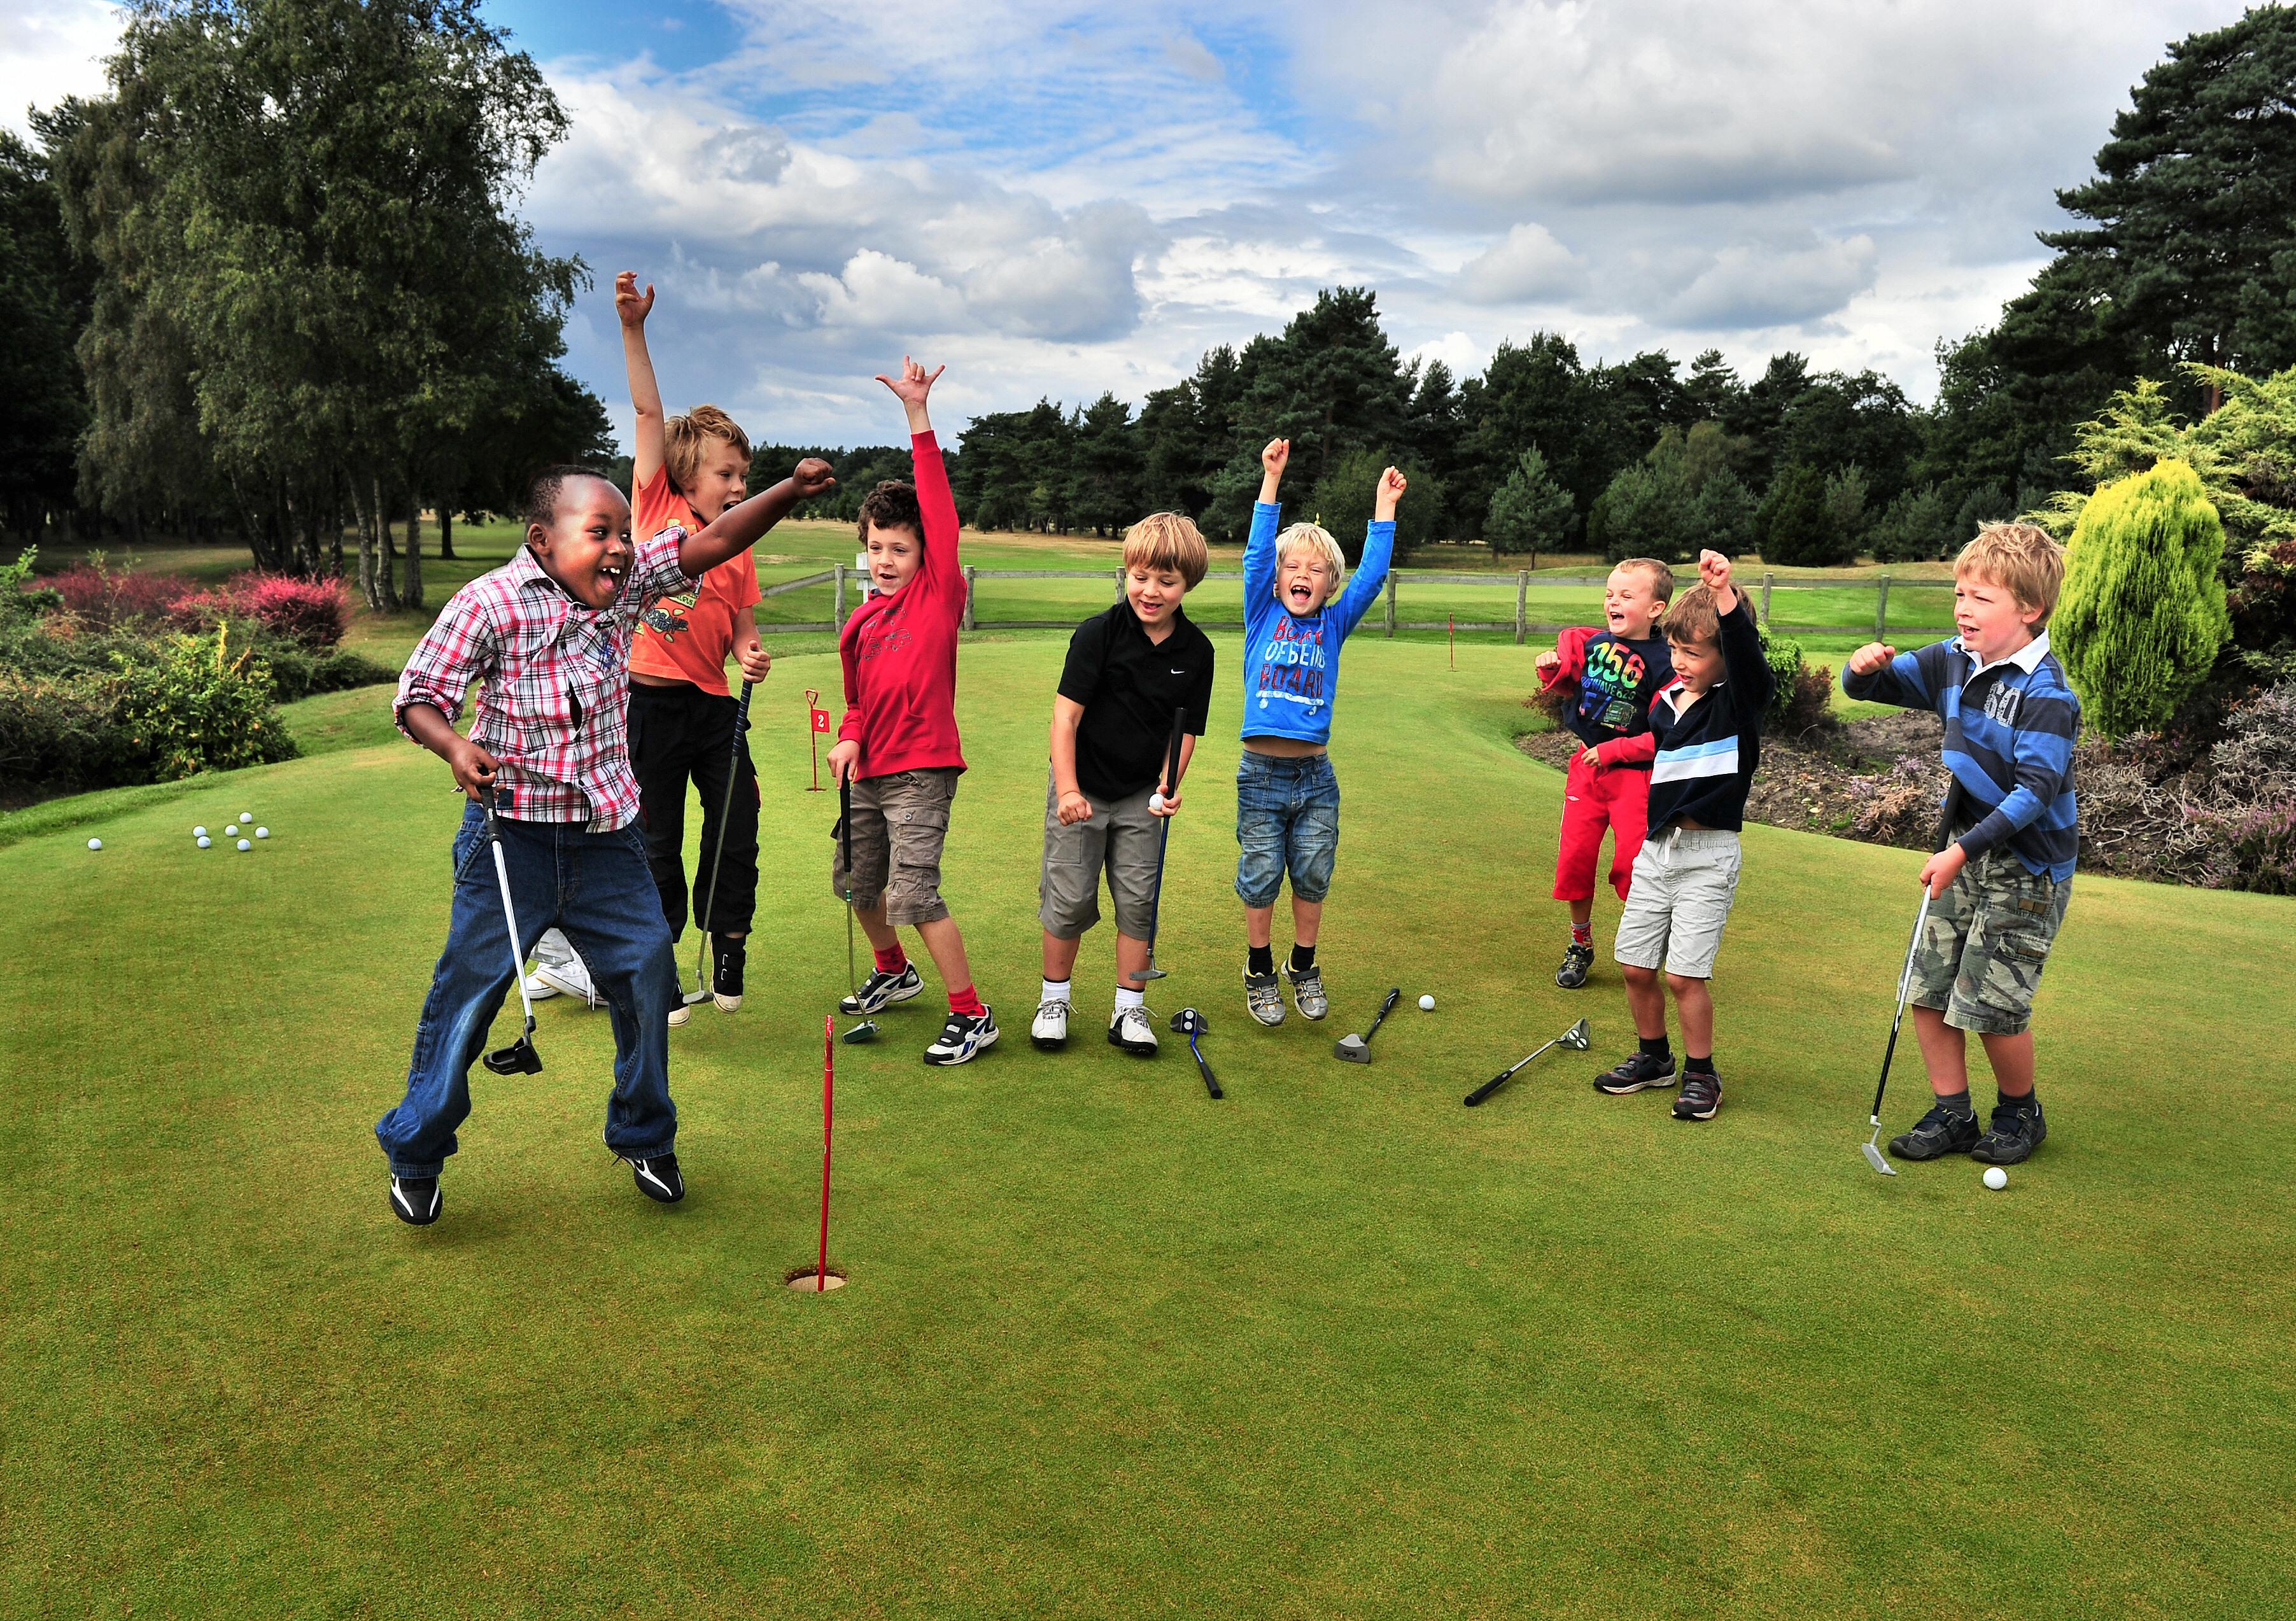 Labsters golf clinics